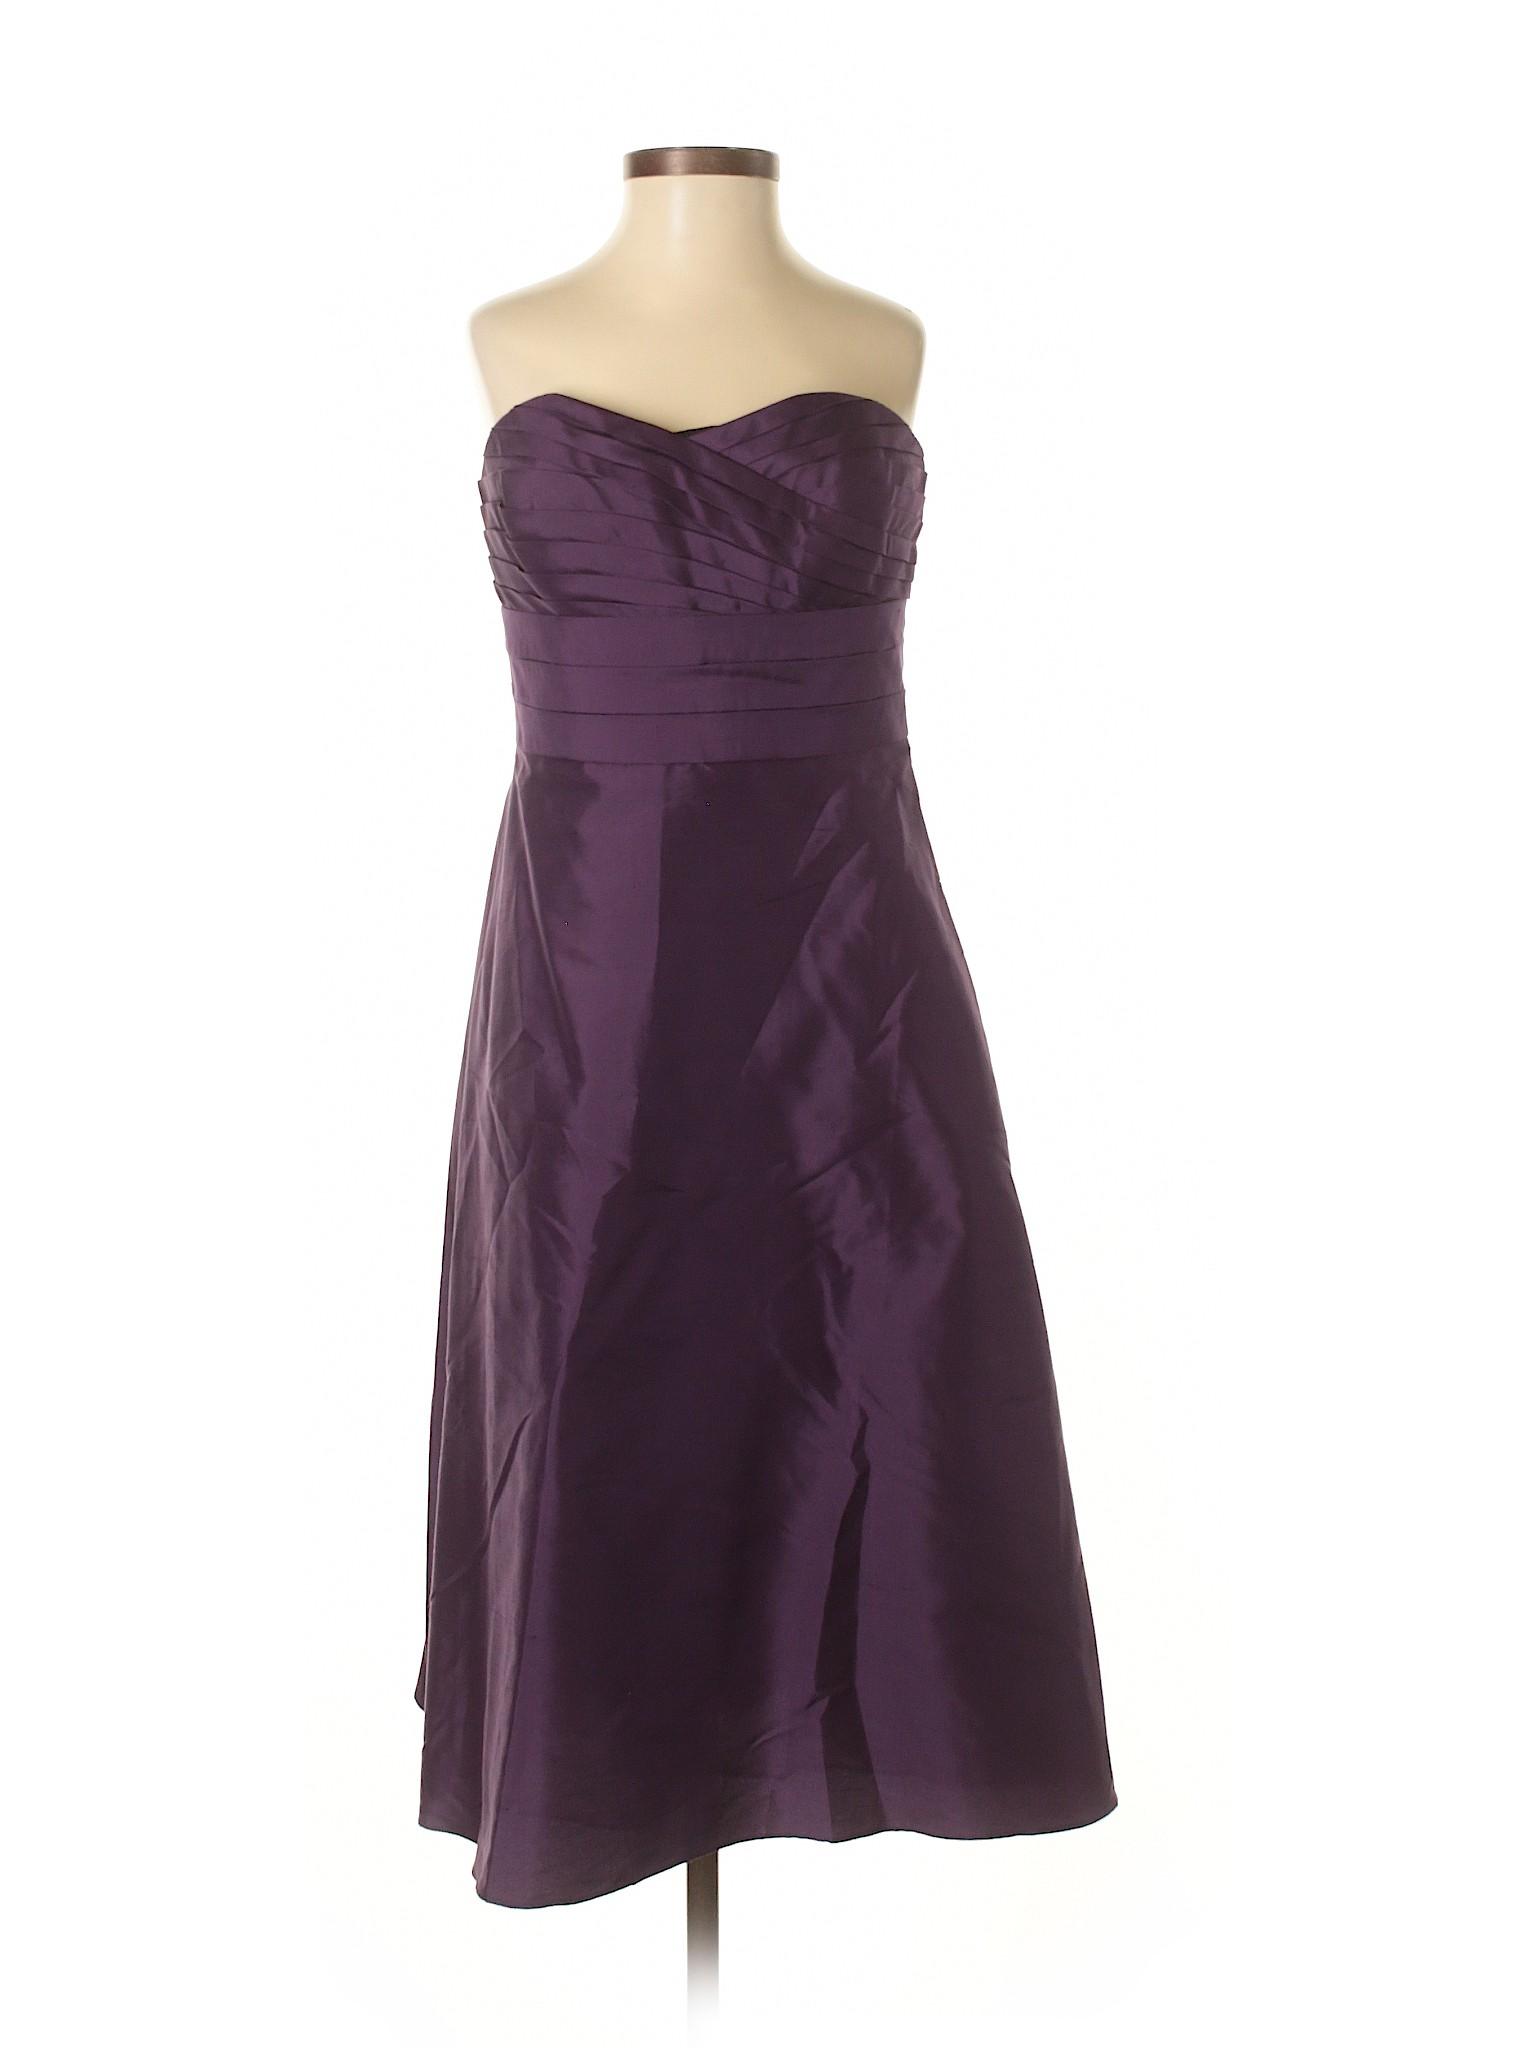 Taylor Dress winter Ann Boutique Cocktail R6xwT8qgX